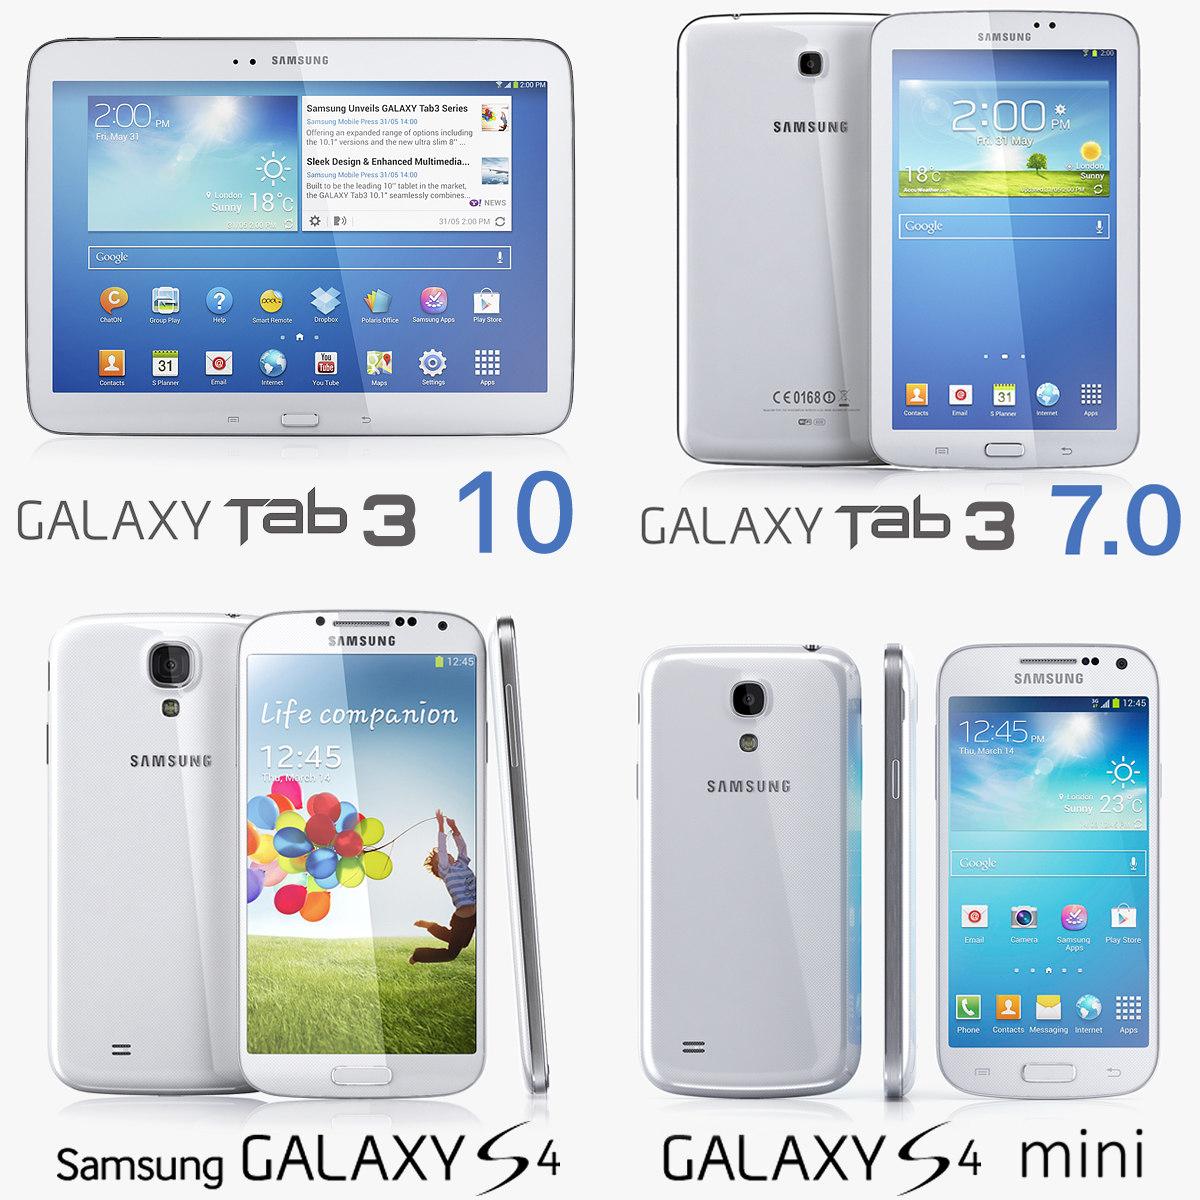 Samsung_GALAXY_Collection_2013.jpg